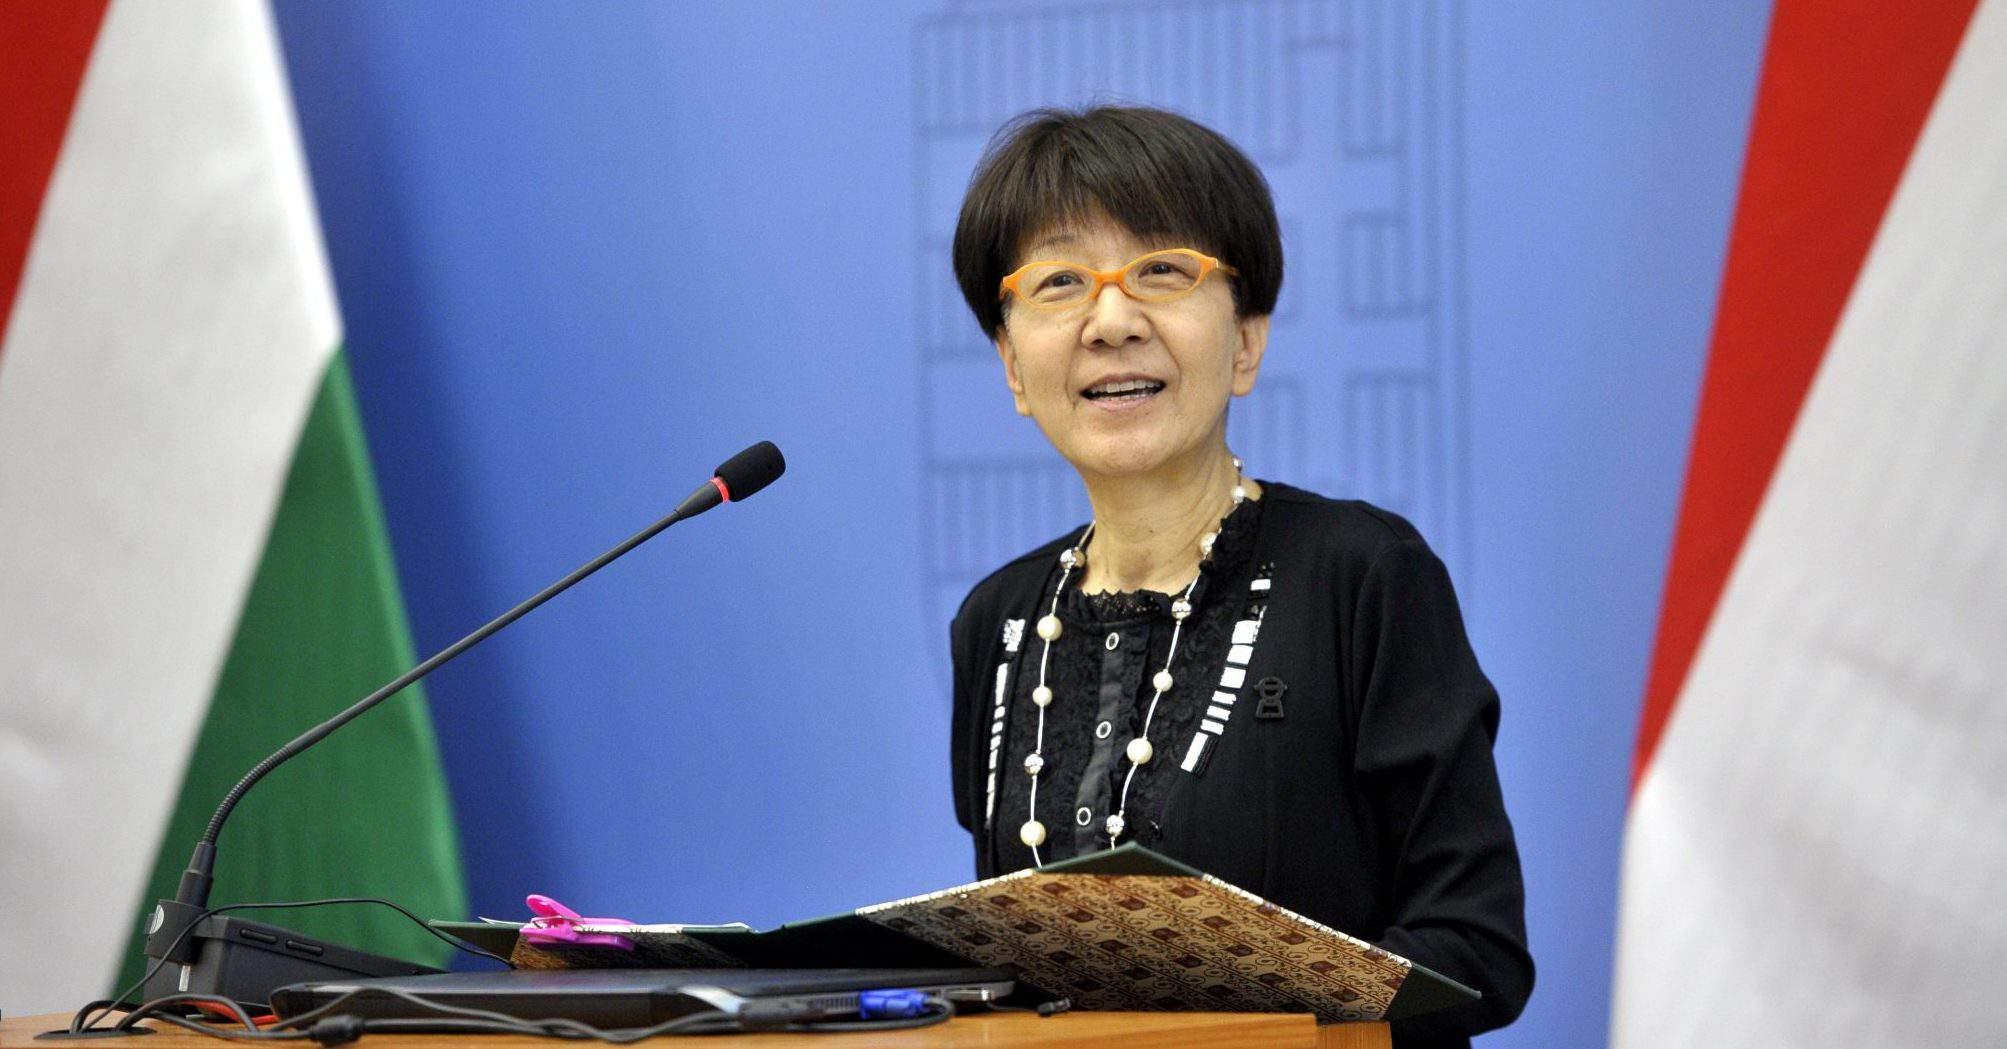 Japanese Ambassador Sato Kuni Hungary